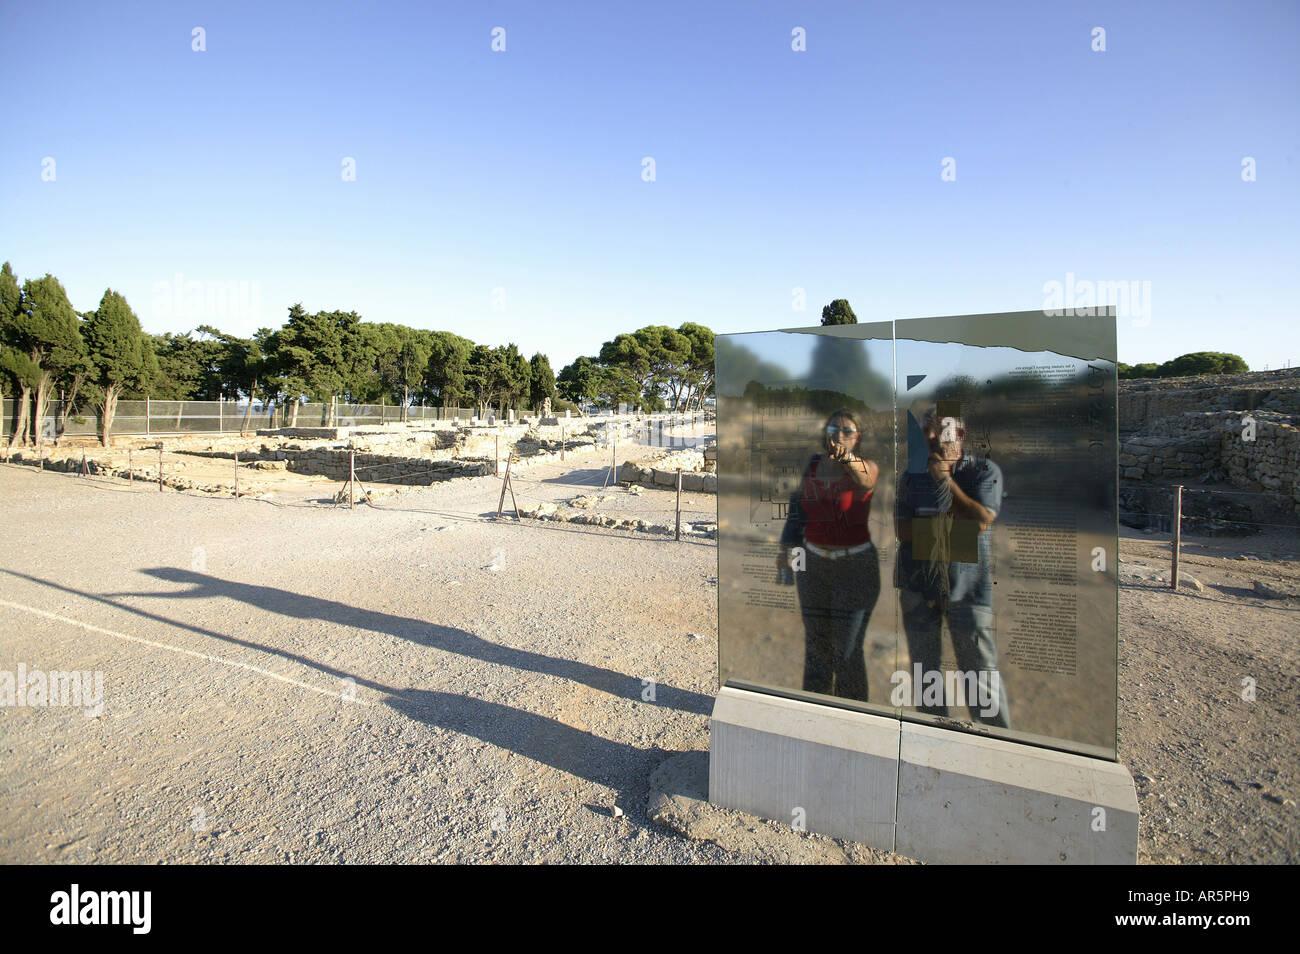 Costa Brava, Information Board, Ancient Greek Settlement of Empuries, Costa Brava, Catalonia Spain - Stock Image